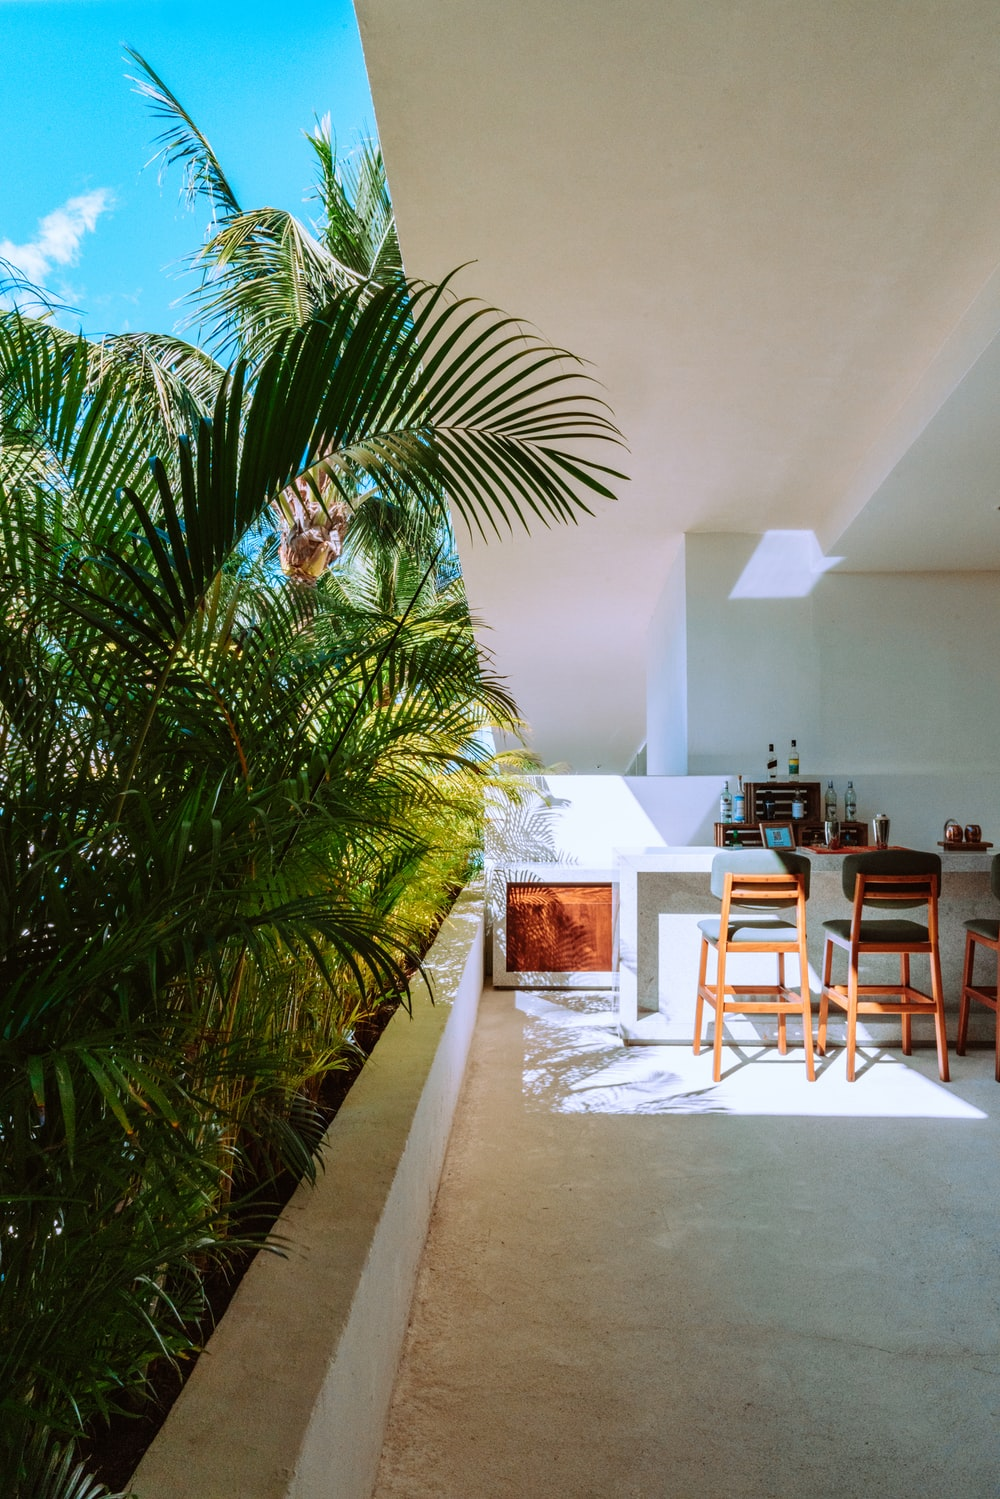 green palm tree near white wall